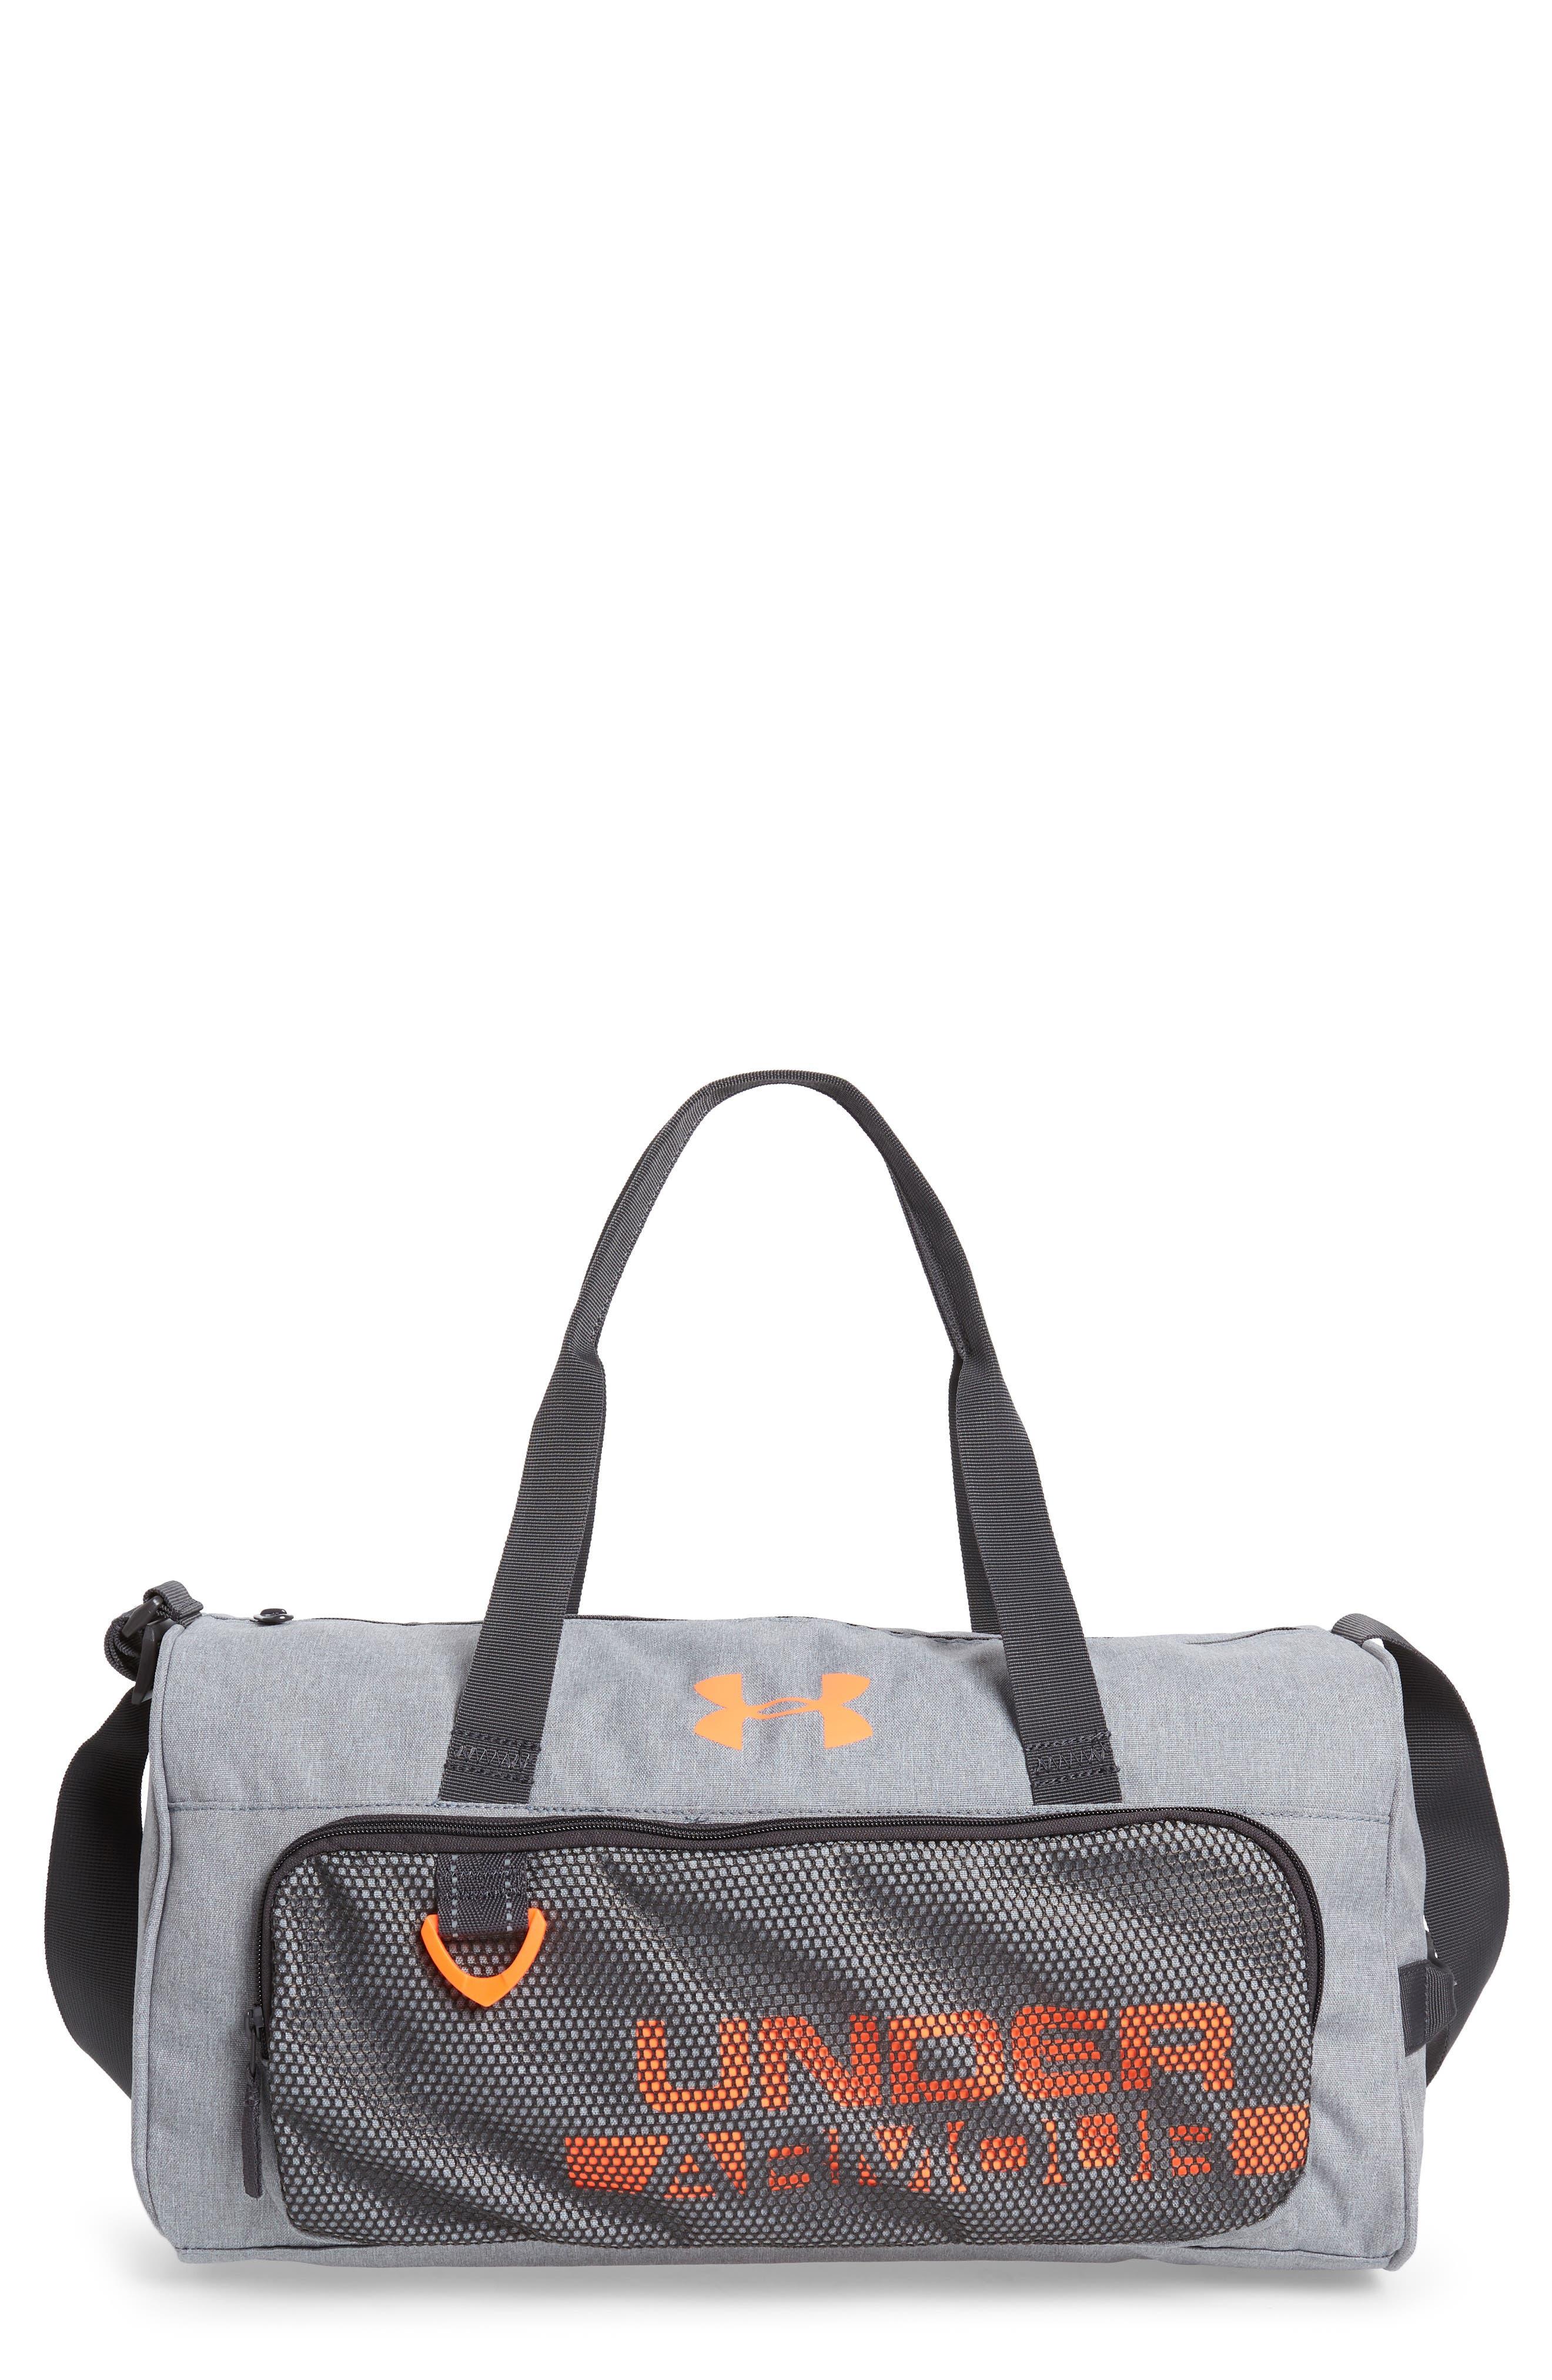 Select Water Resistant Duffel Bag, Main, color, STEEL HEATHER /CHARCOAL/ORANGE